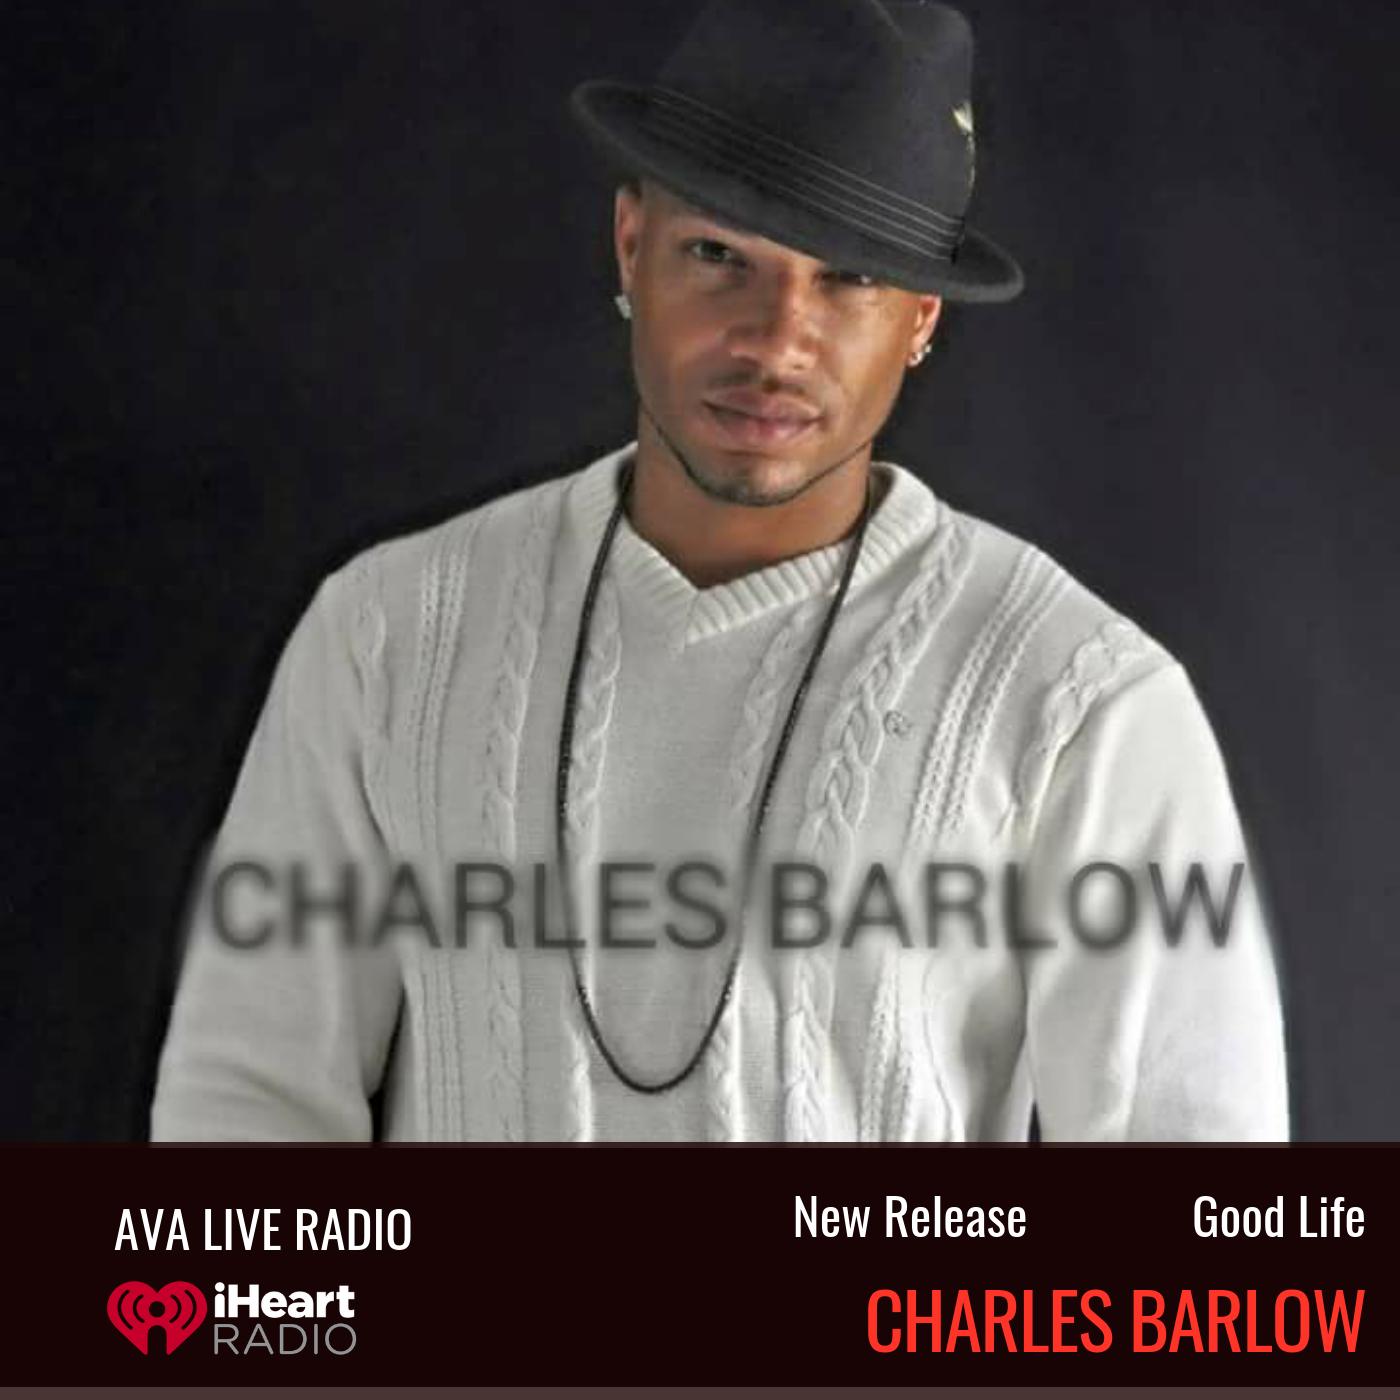 Charles Barlow avaliveradio 1.png